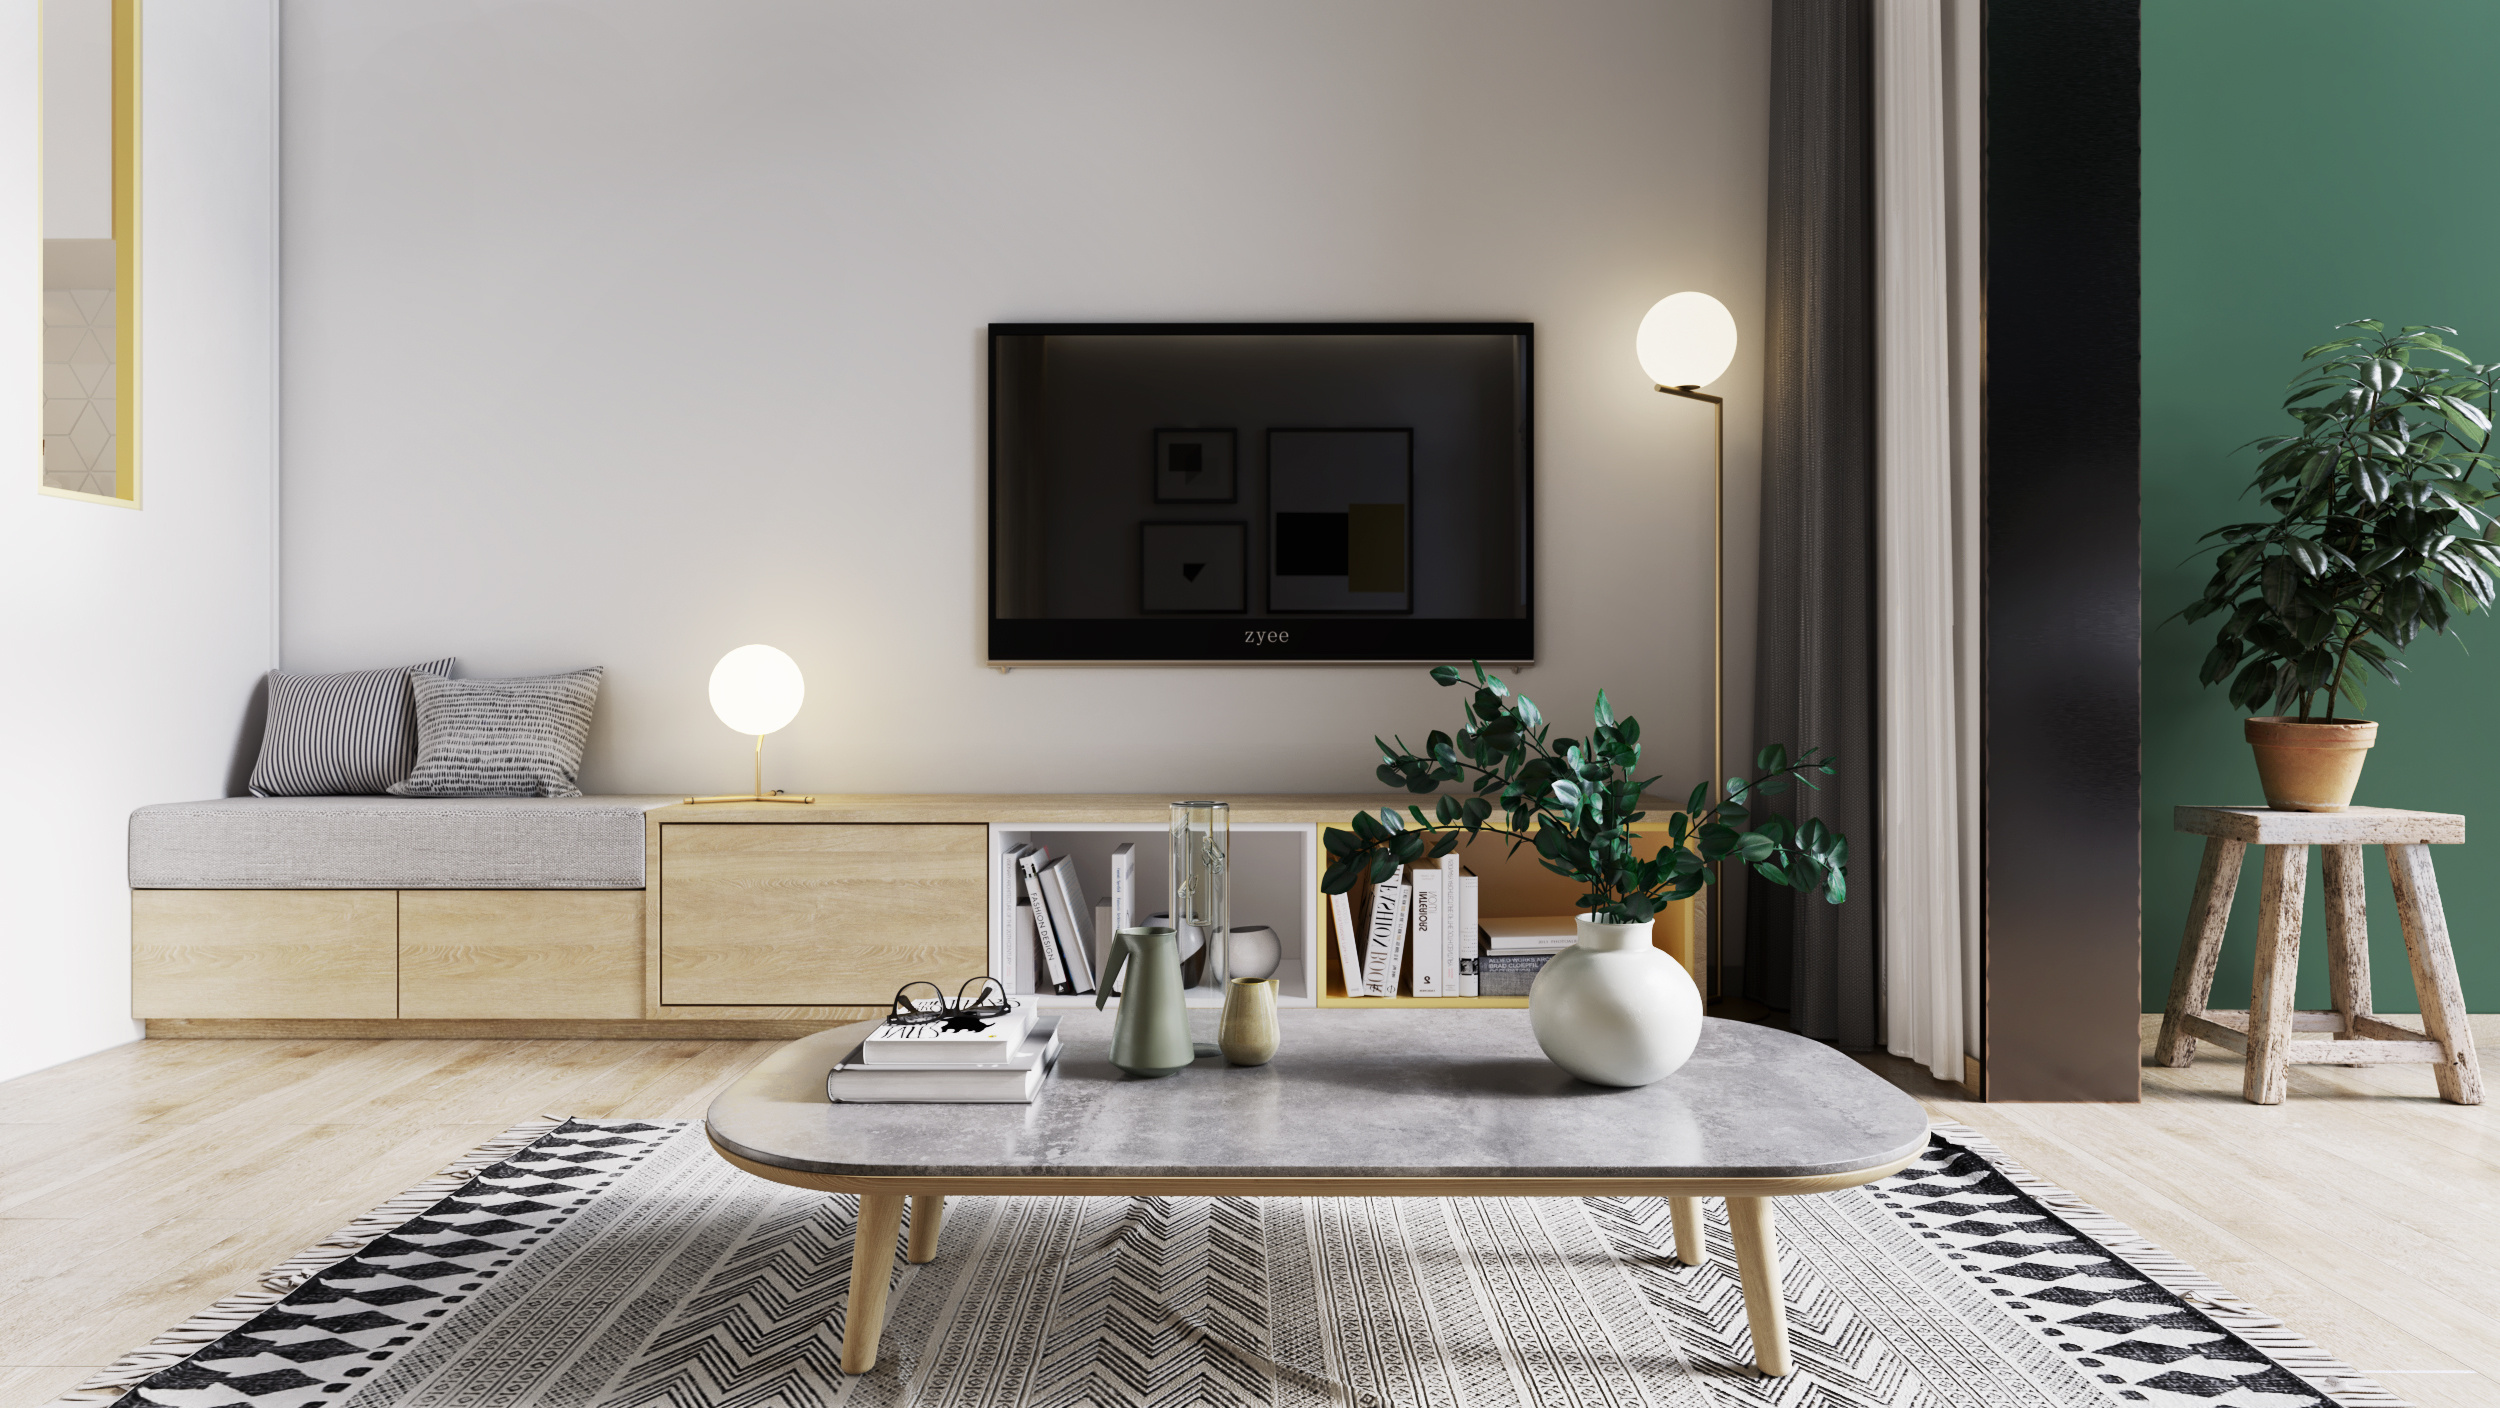 loft清新小住宅|空间|室内设计|zyee - 原创作品